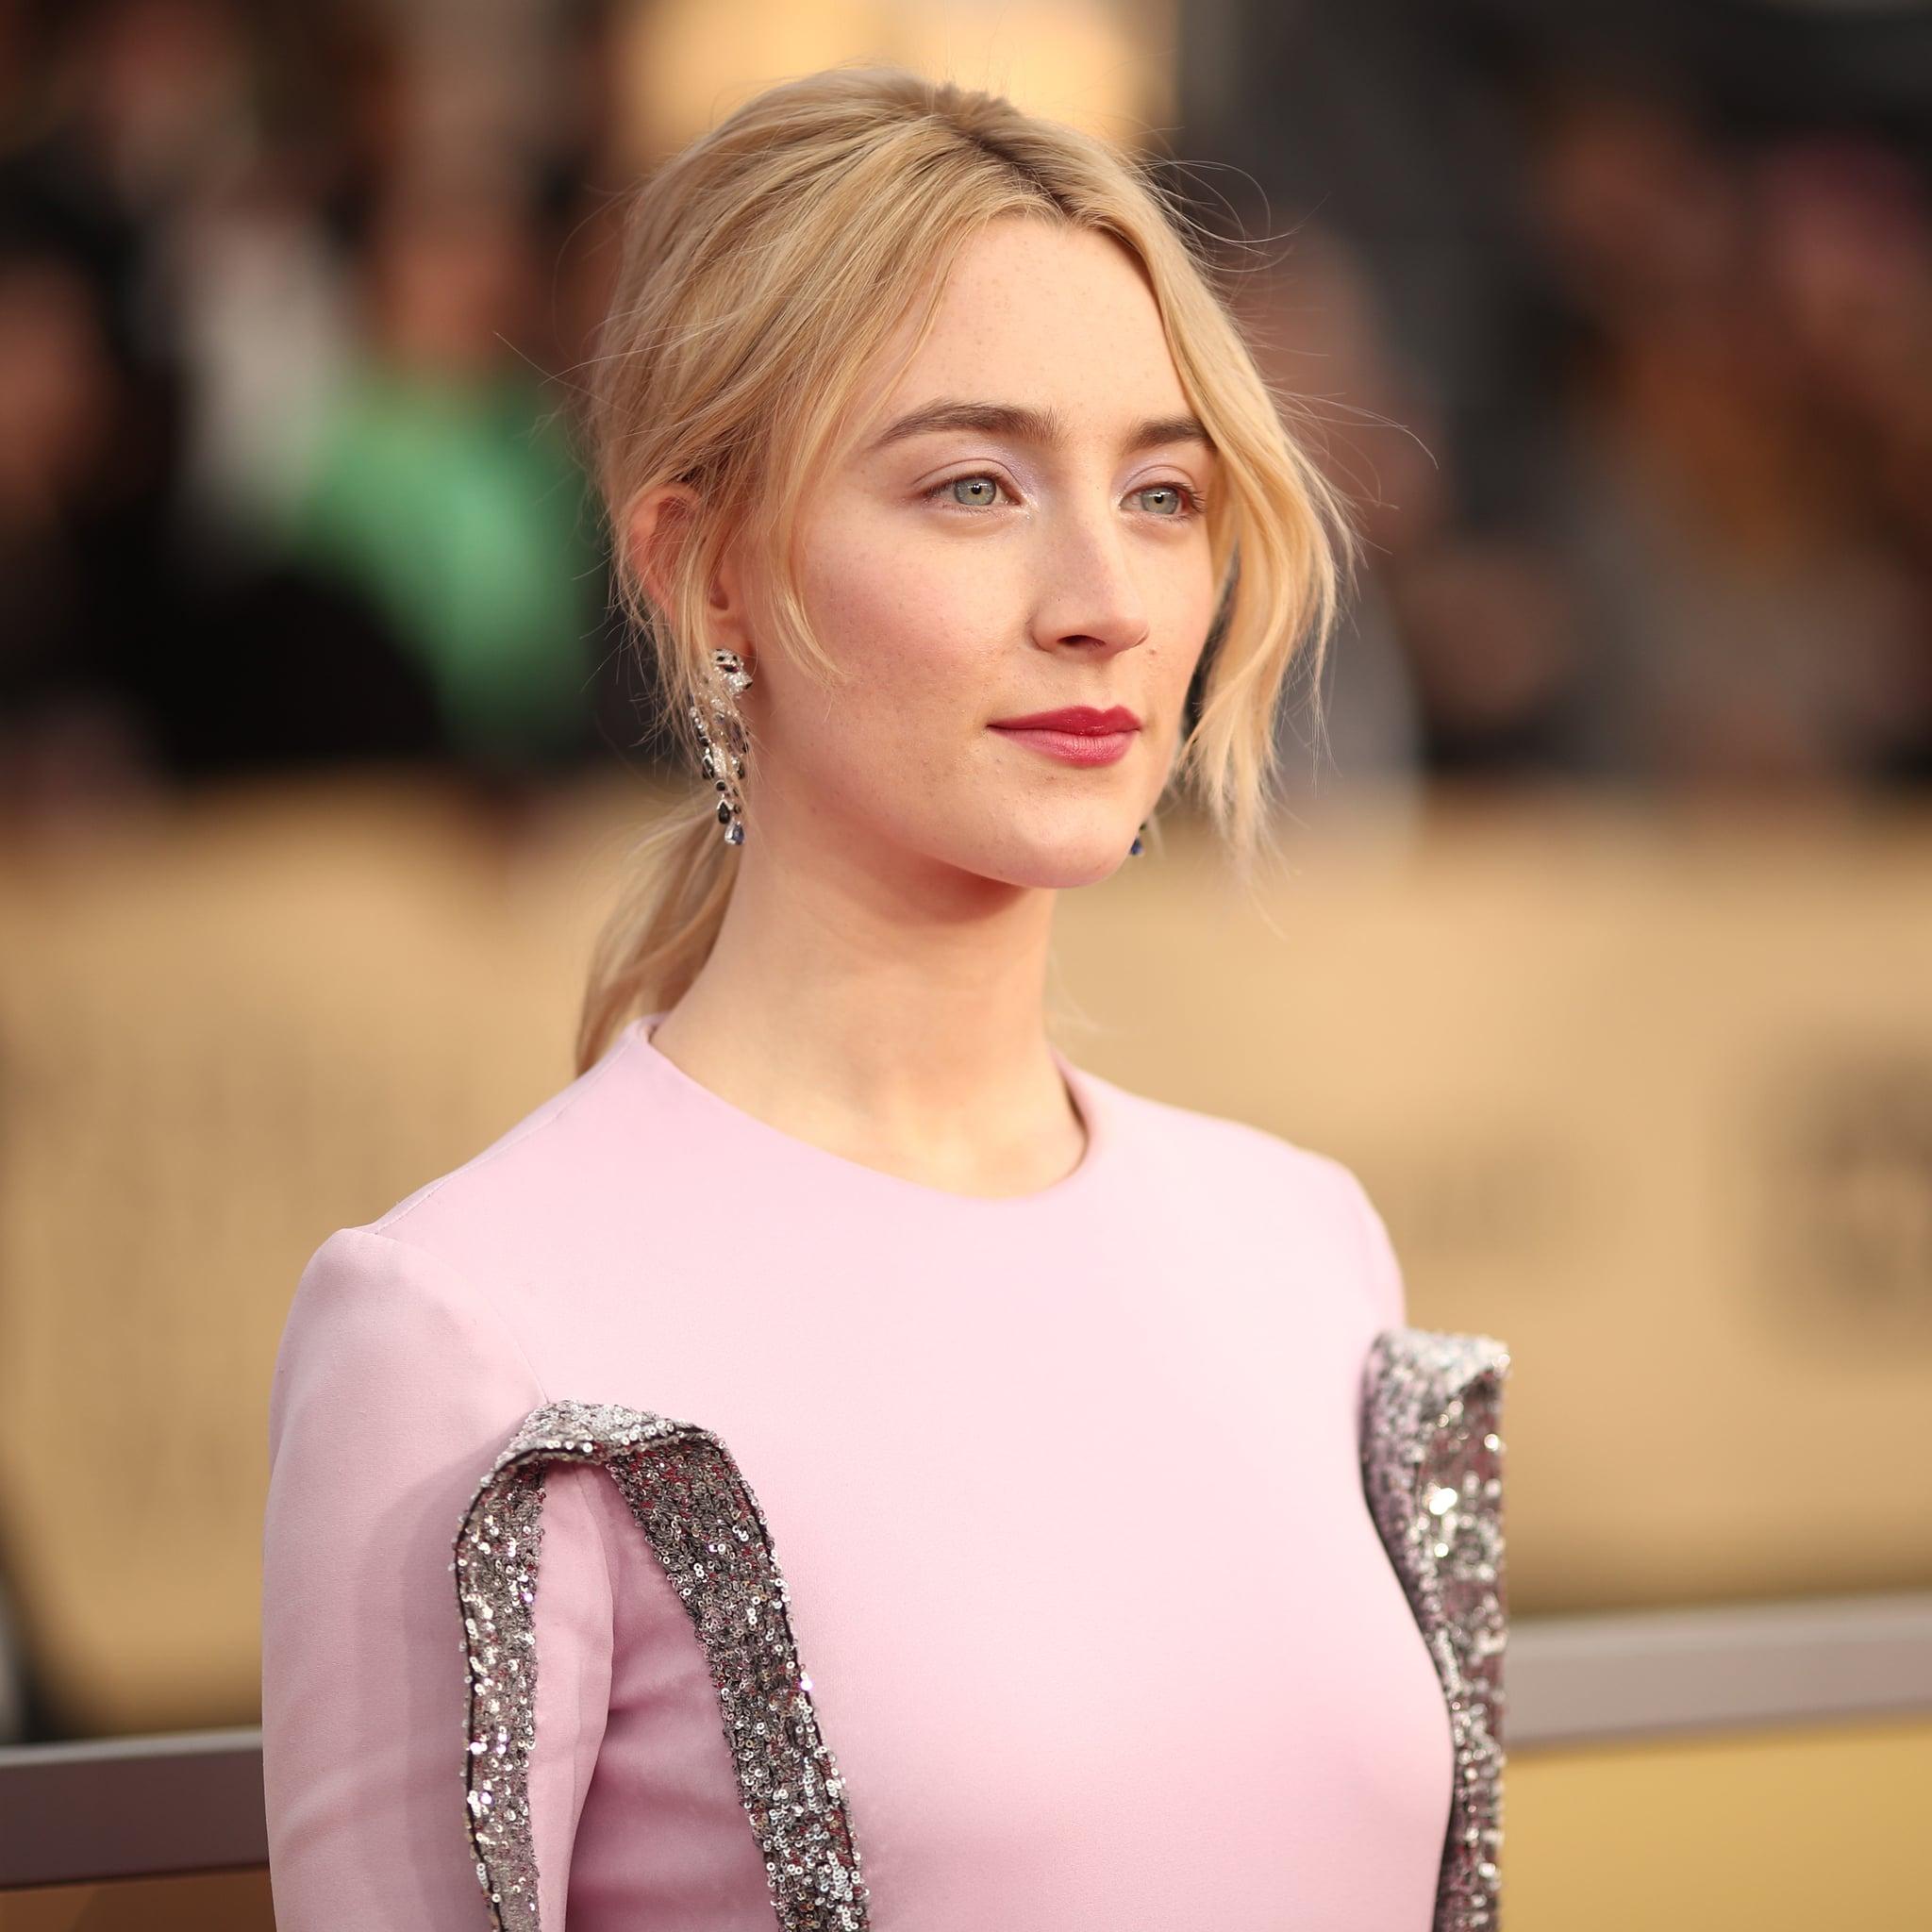 Who Is Saoirse Ronan Dating? Ex-Boyfriend Relationship Timeline